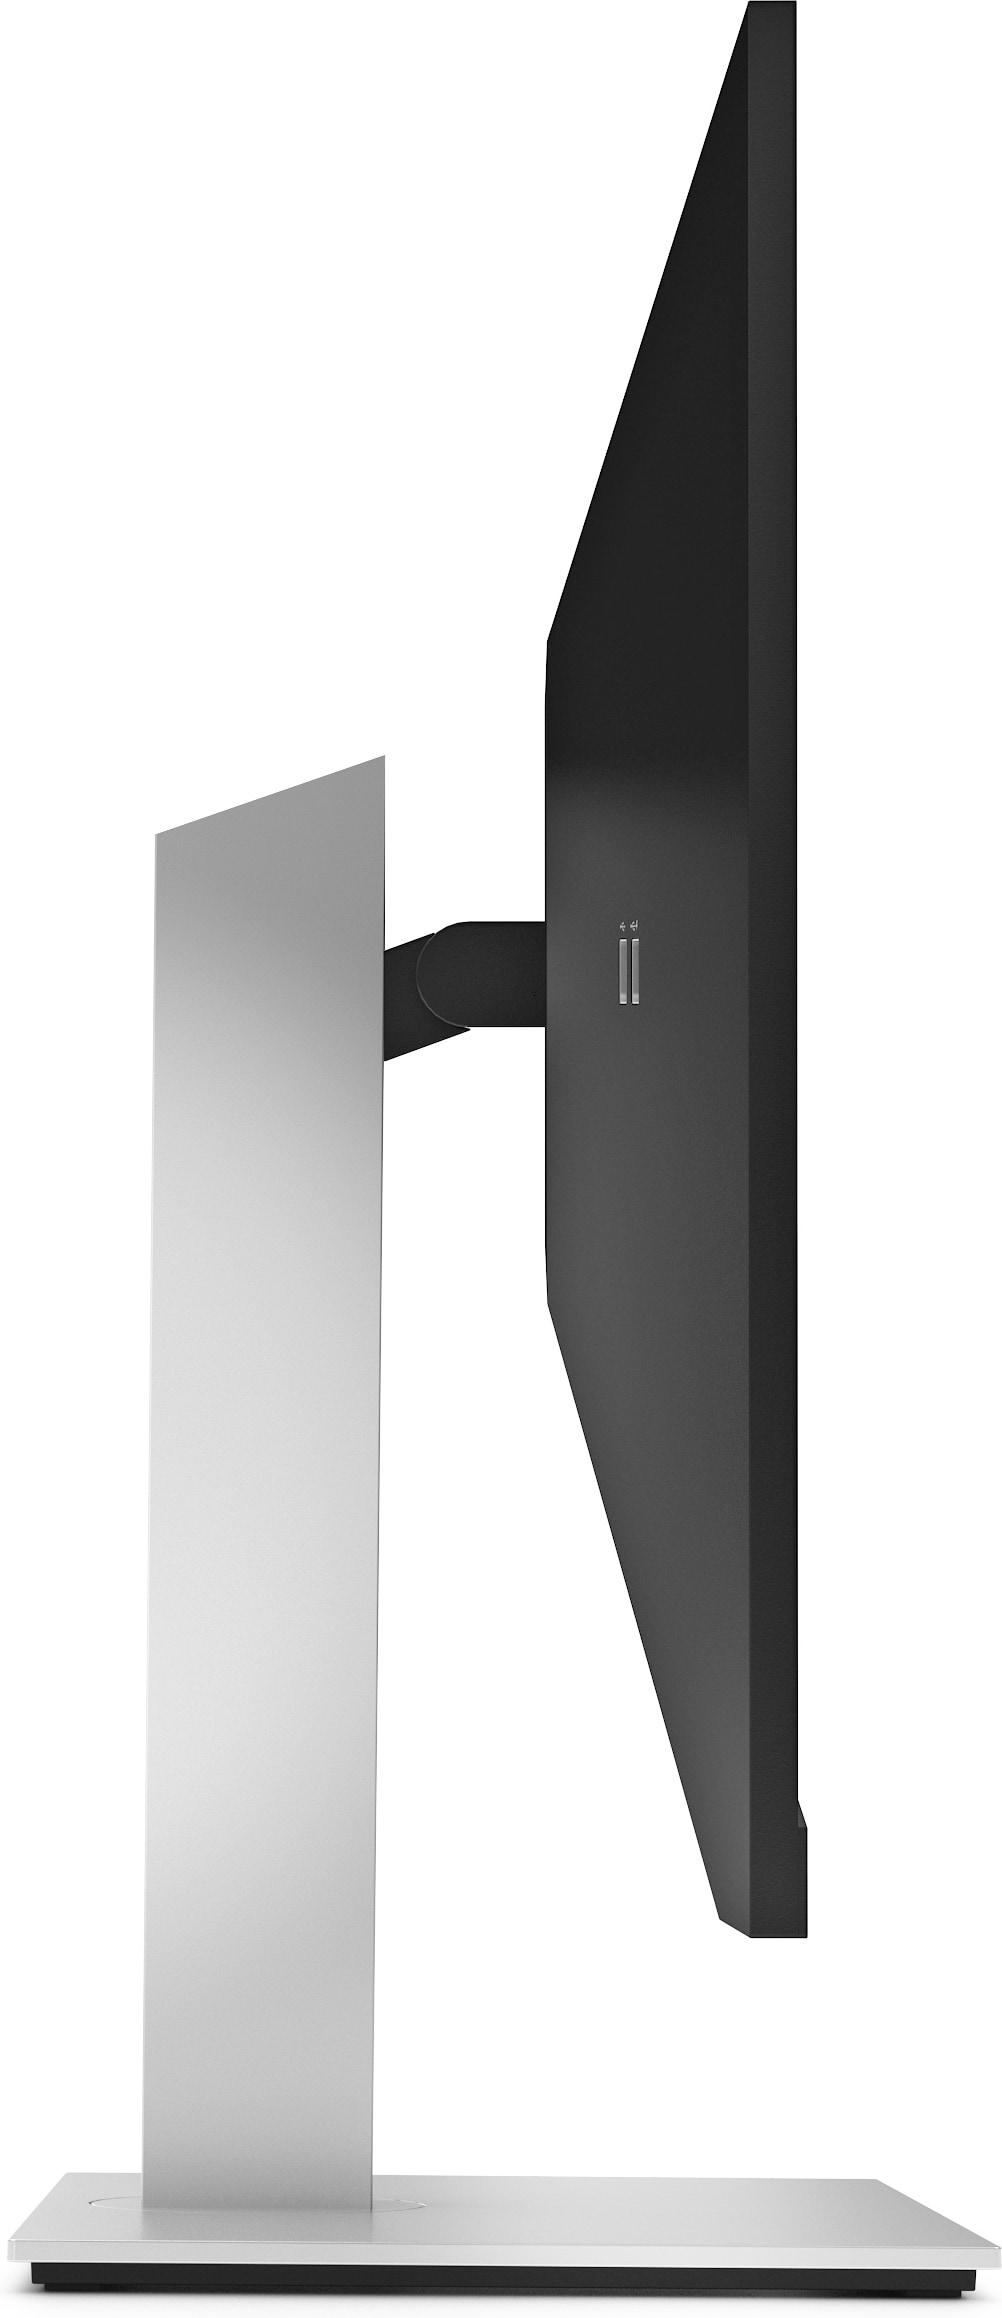 HP 189T3AA E27u G4 68,6 cm-es (27 hüvelykes) 2560x1440@60 USB-C monitor